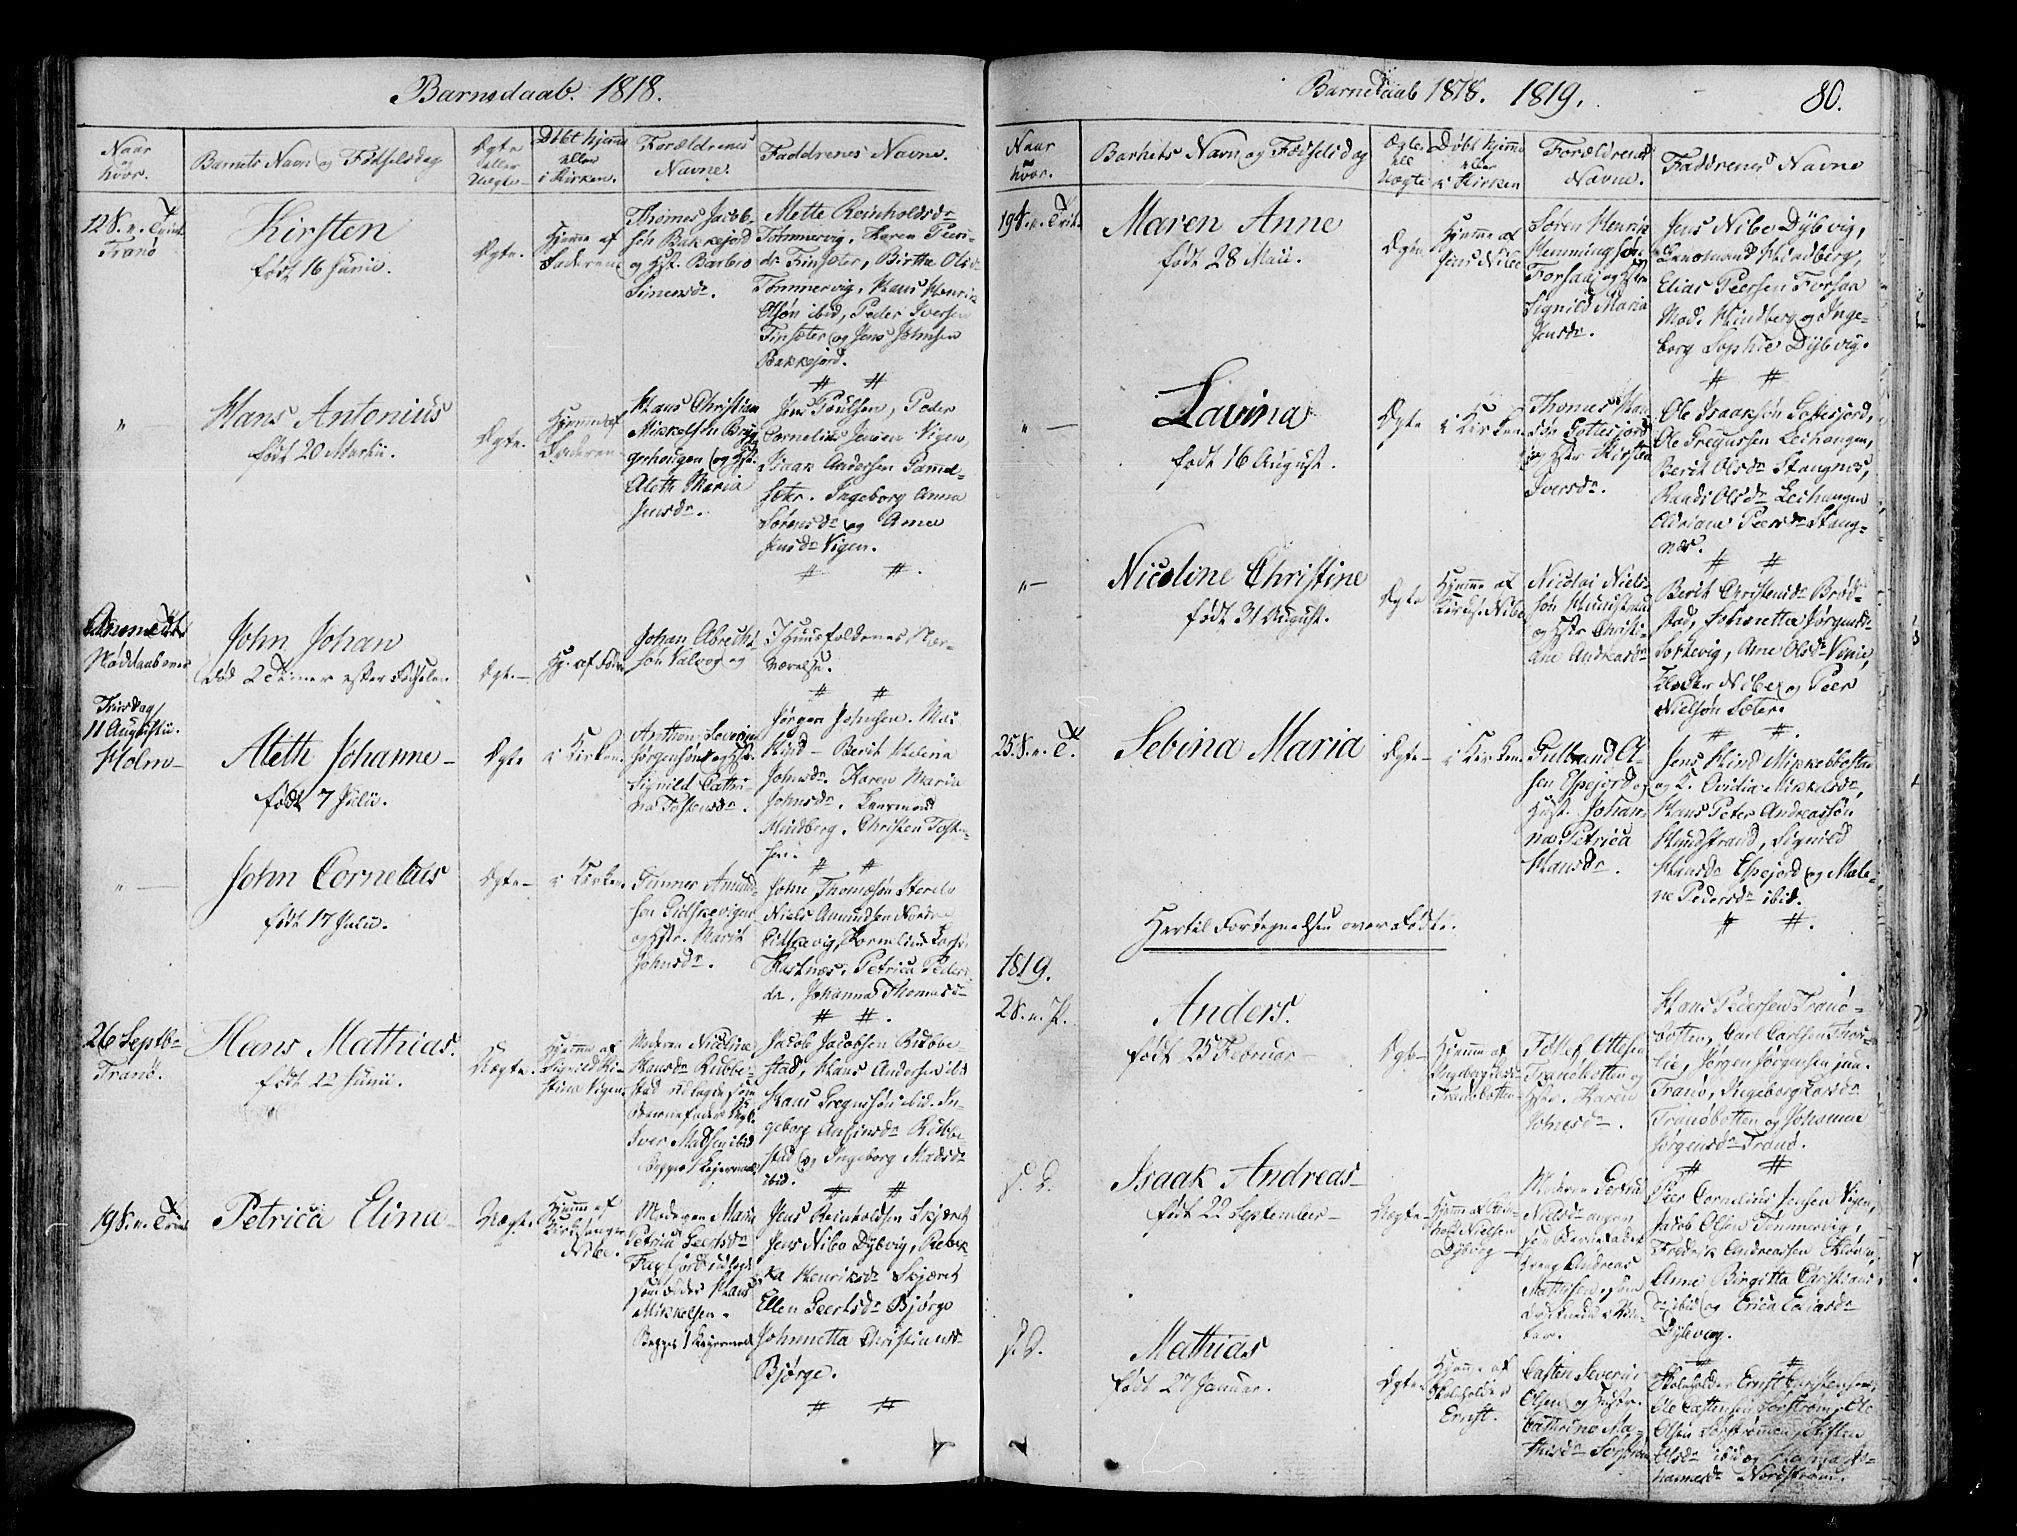 SATØ, Tranøy sokneprestkontor, I/Ia/Iaa/L0003kirke: Ministerialbok nr. 3, 1807-1820, s. 80